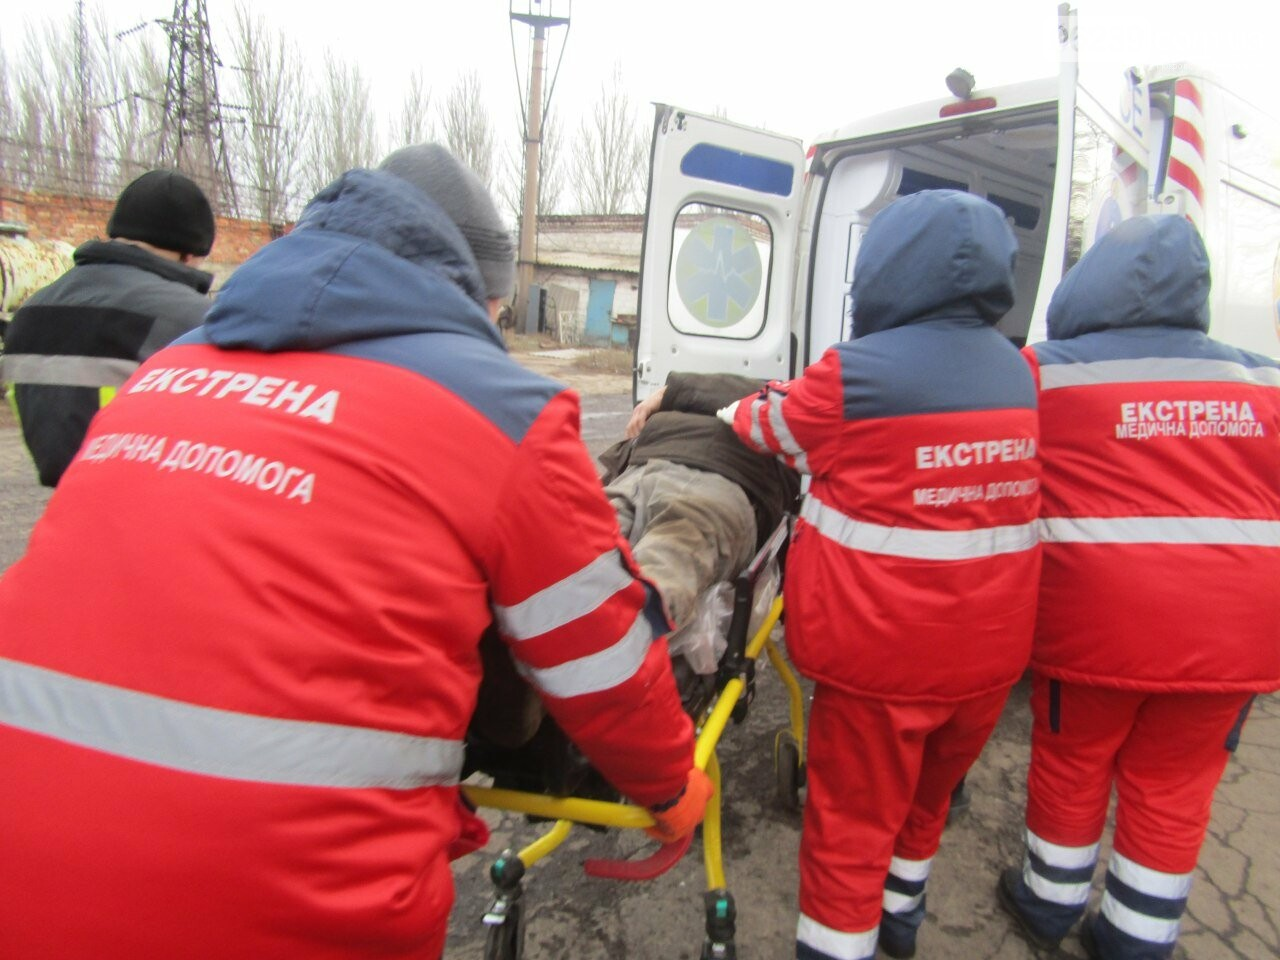 В Покровске на пункте приема металла сегодня произошло ЧП, фото-1